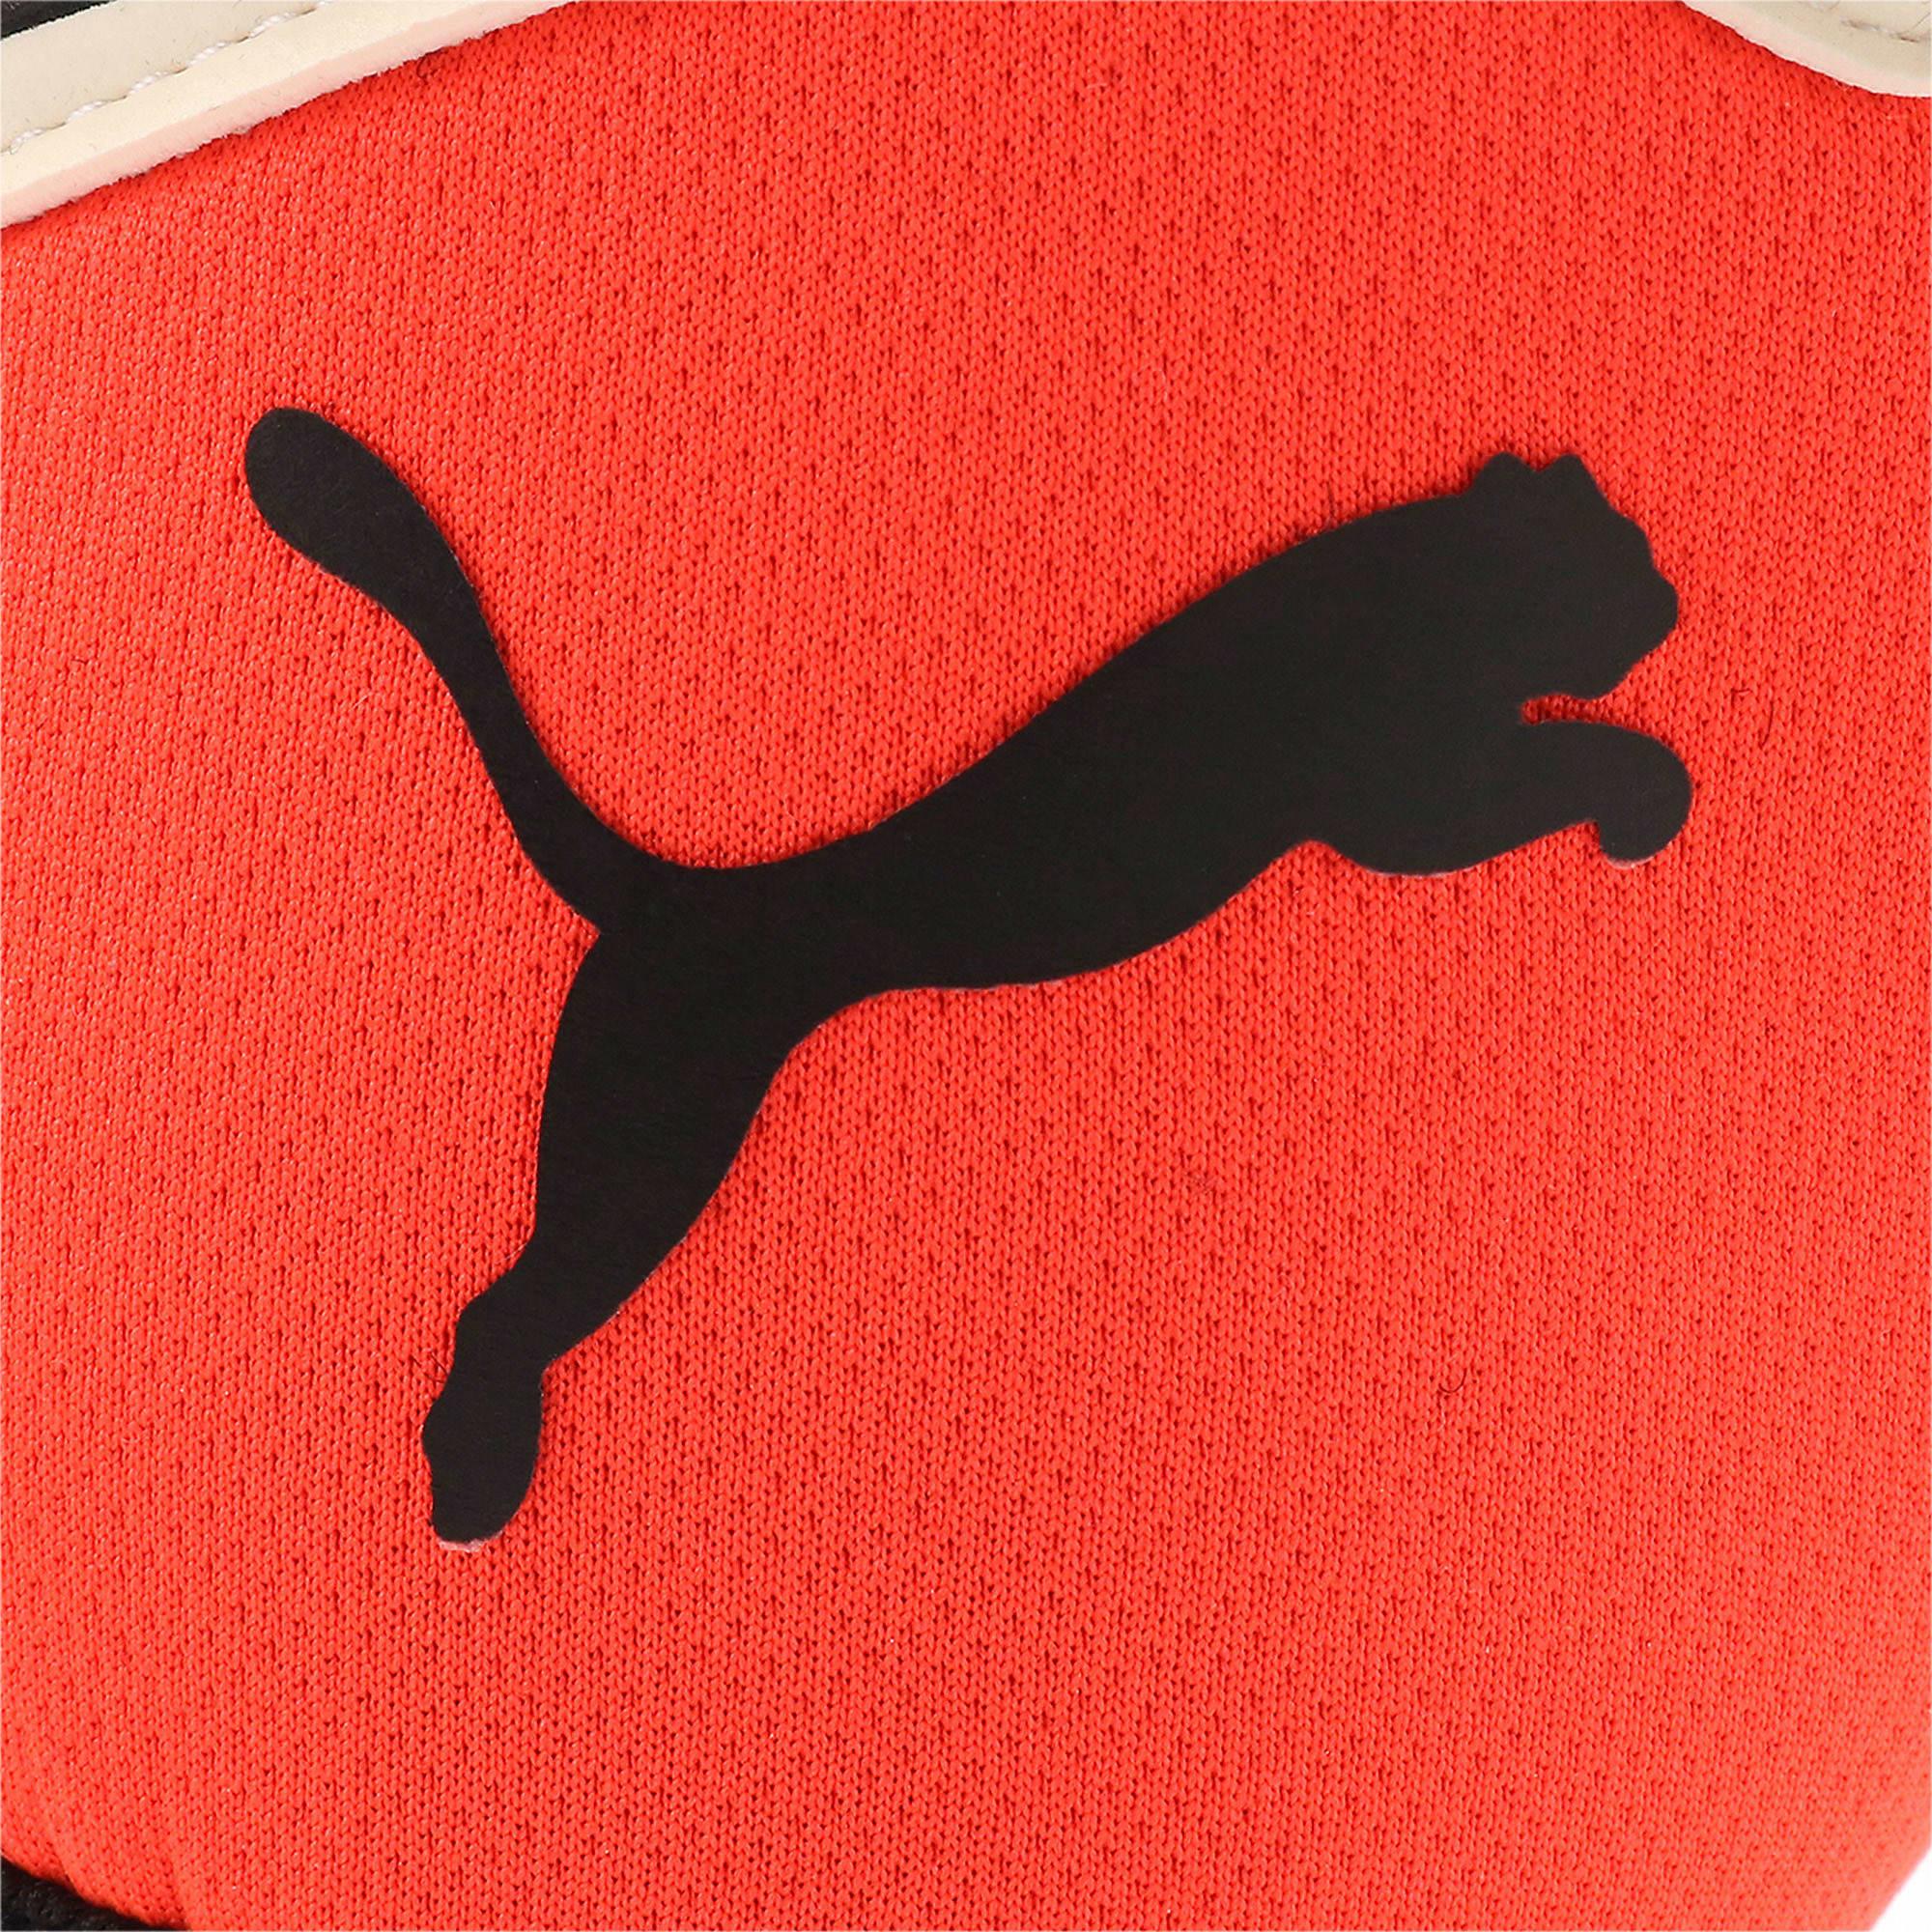 Thumbnail 3 of プーマ ワン グリップ 1 RC サッカー ゴールキーパーグローブ, Nrgy Red-Black-Puma White, medium-JPN